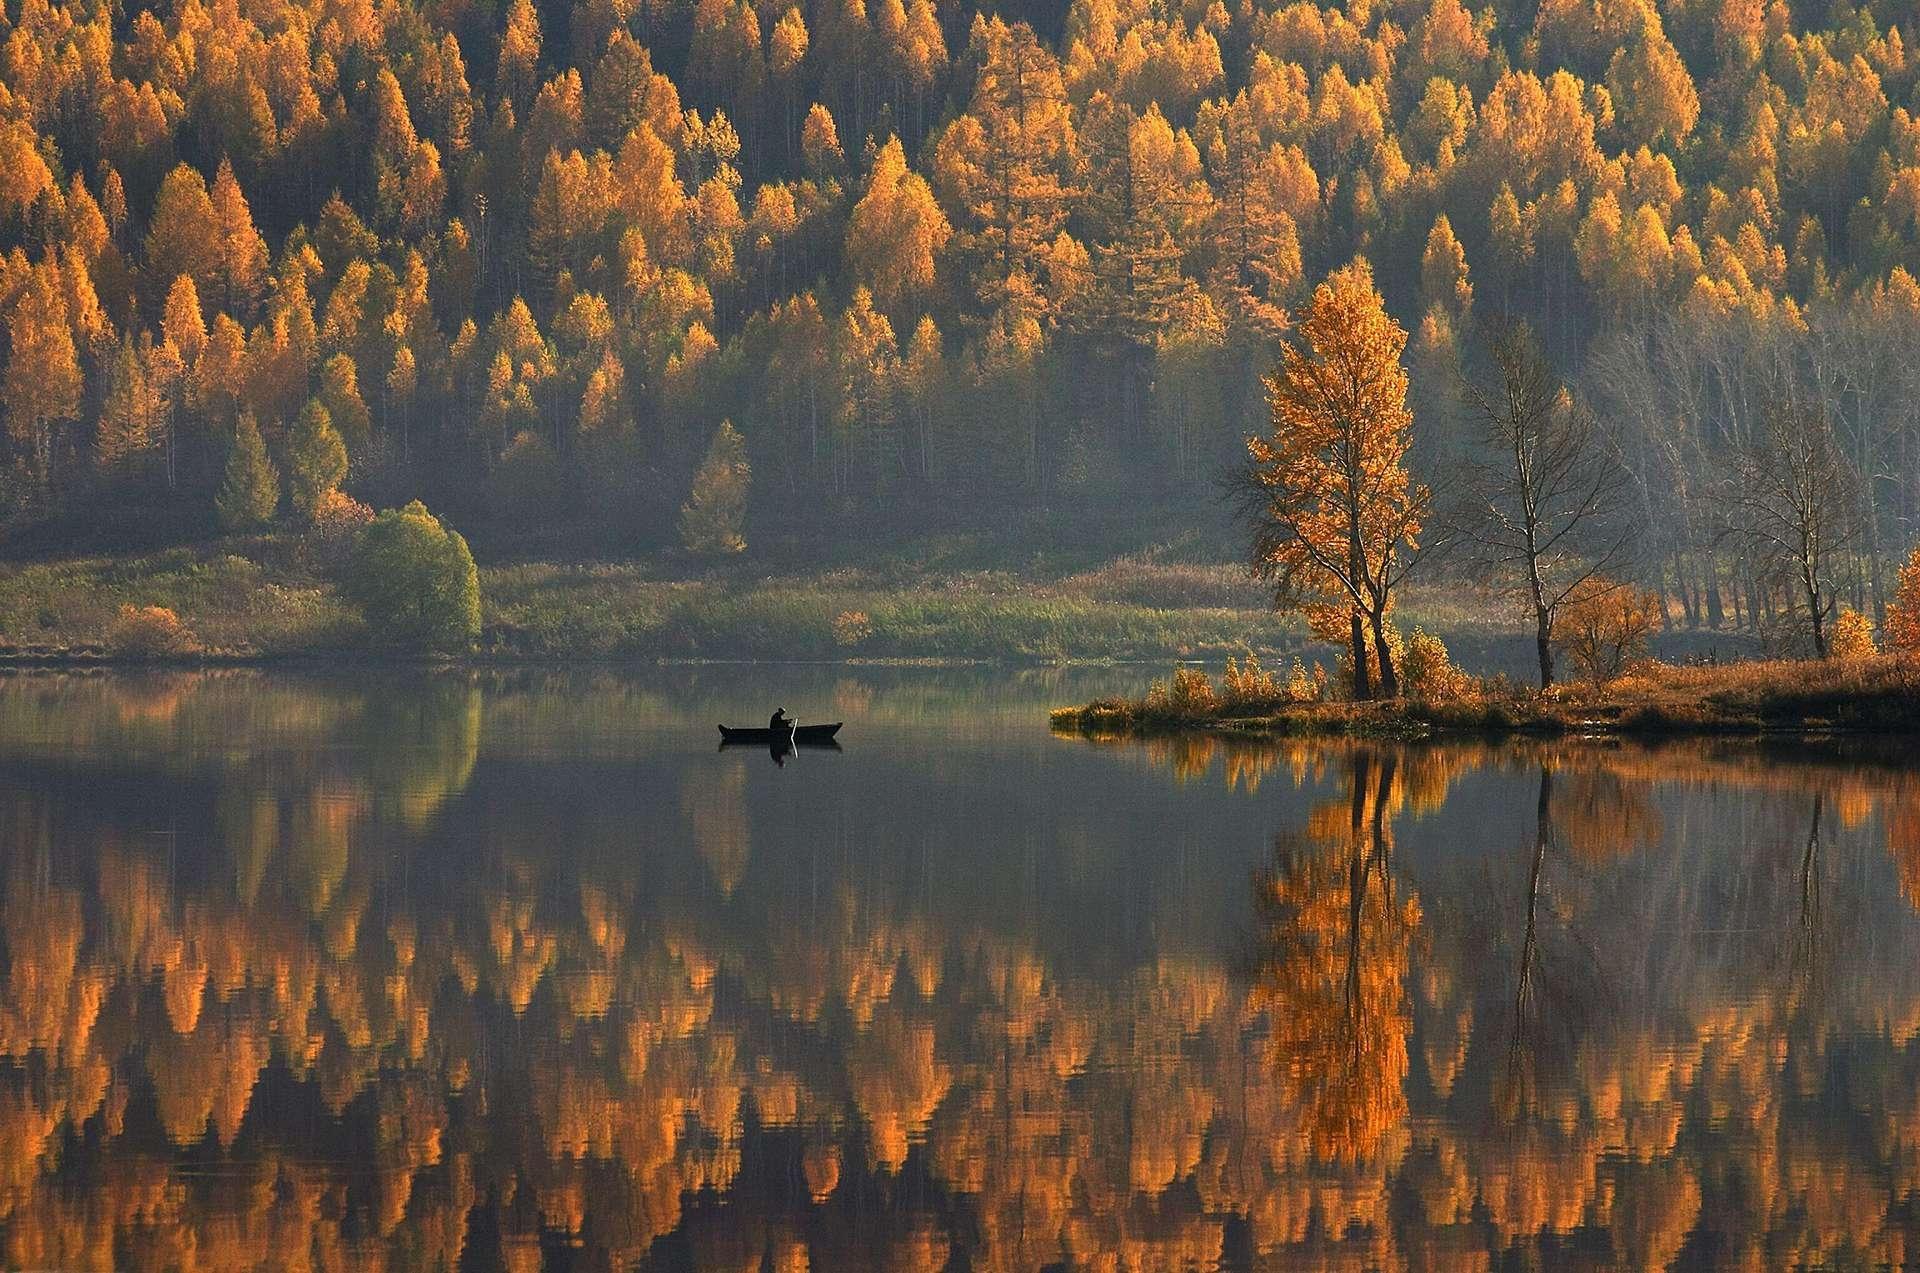 Photograph by Mikhail Trakhtenberg